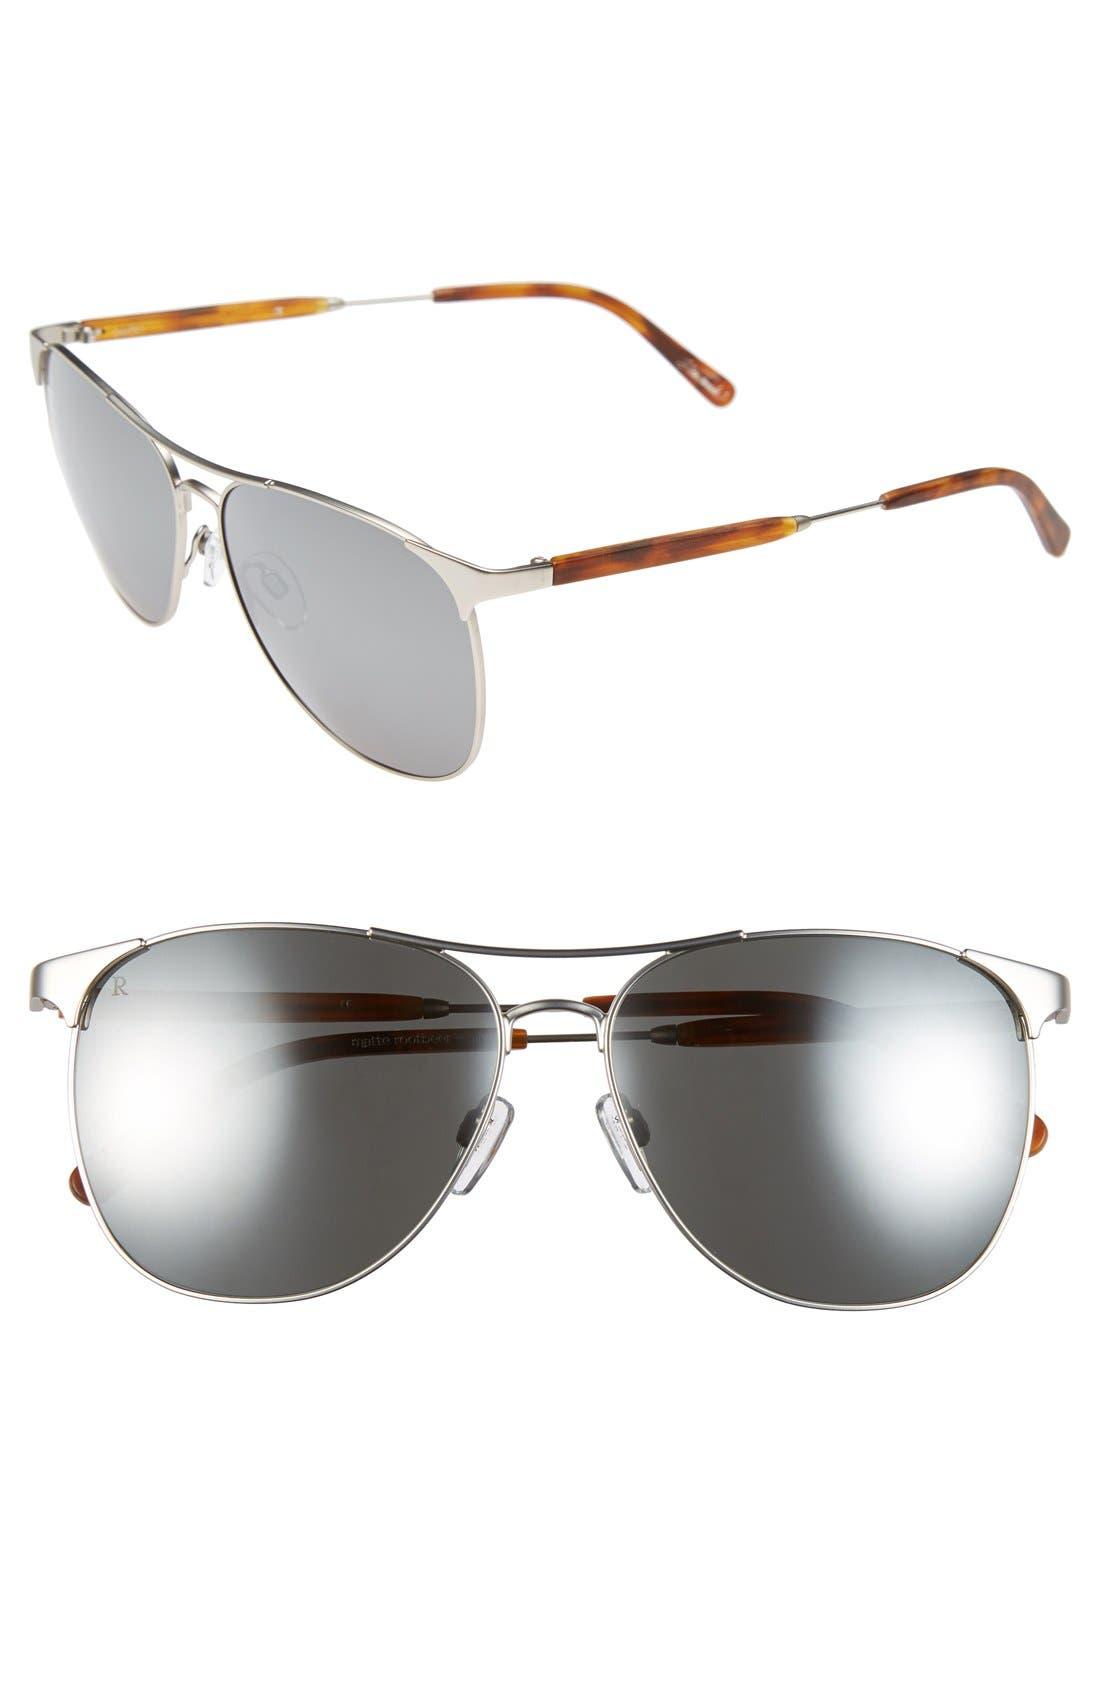 Alternate Image 1 Selected - RAEN 'Castor' 58mm Sunglasses